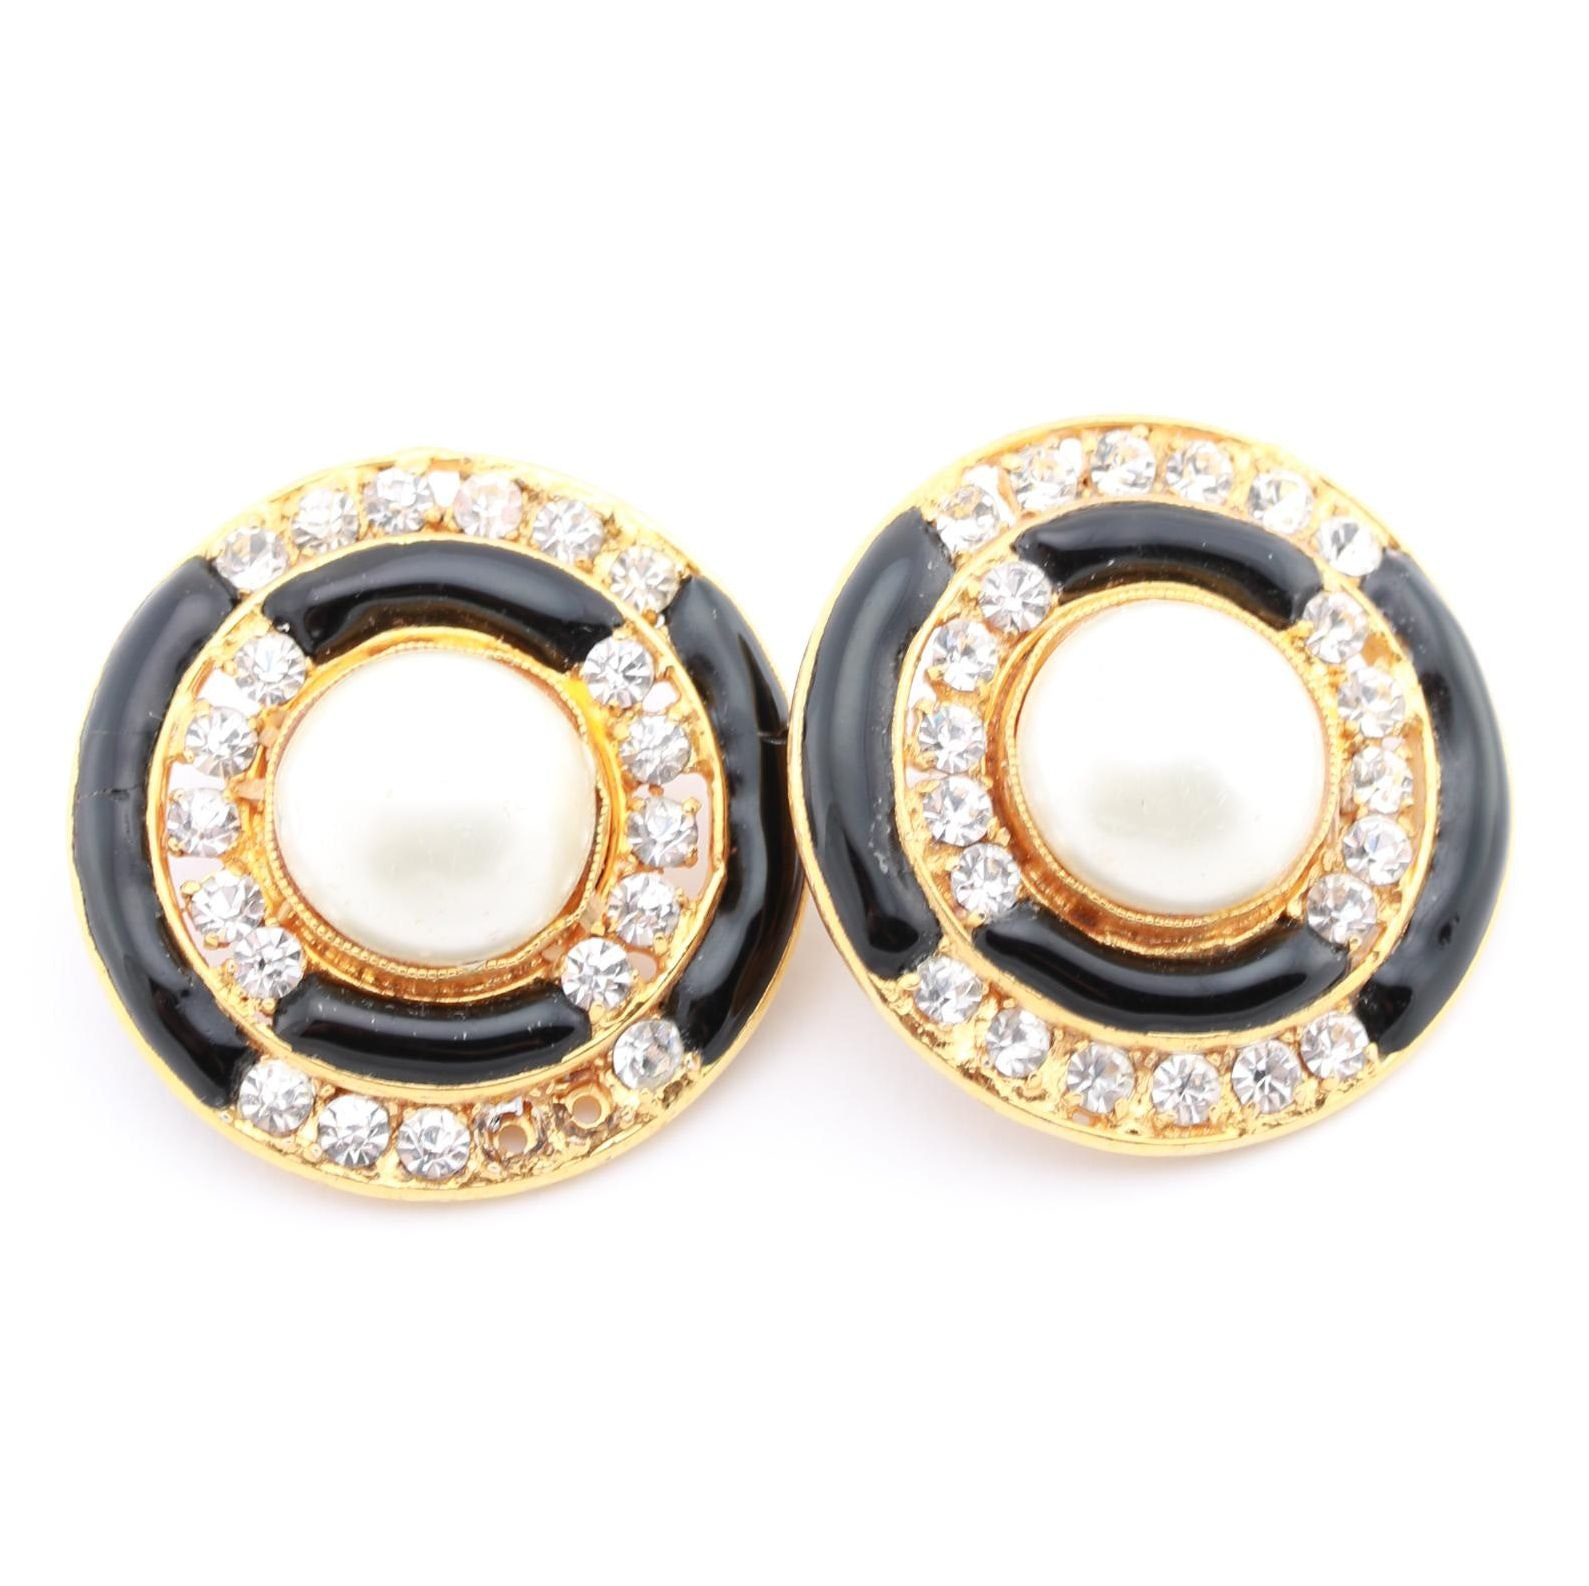 Chanel Rhinestone and Faux Pearl Earrings